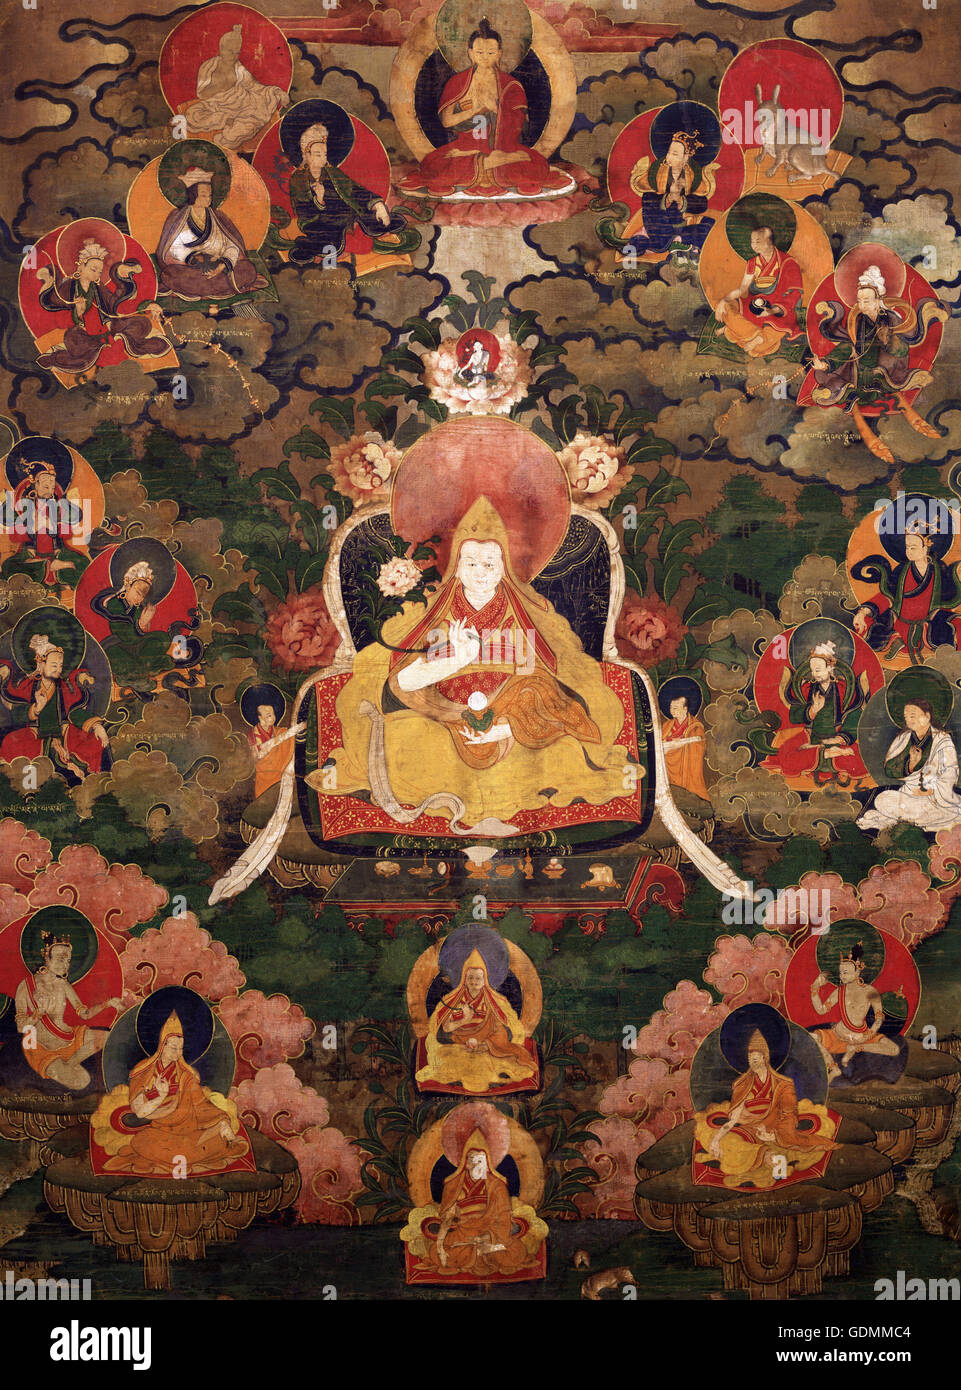 Seventh Dalai Lama, Kalzang Gyatso (1708–1757) - Stock Image